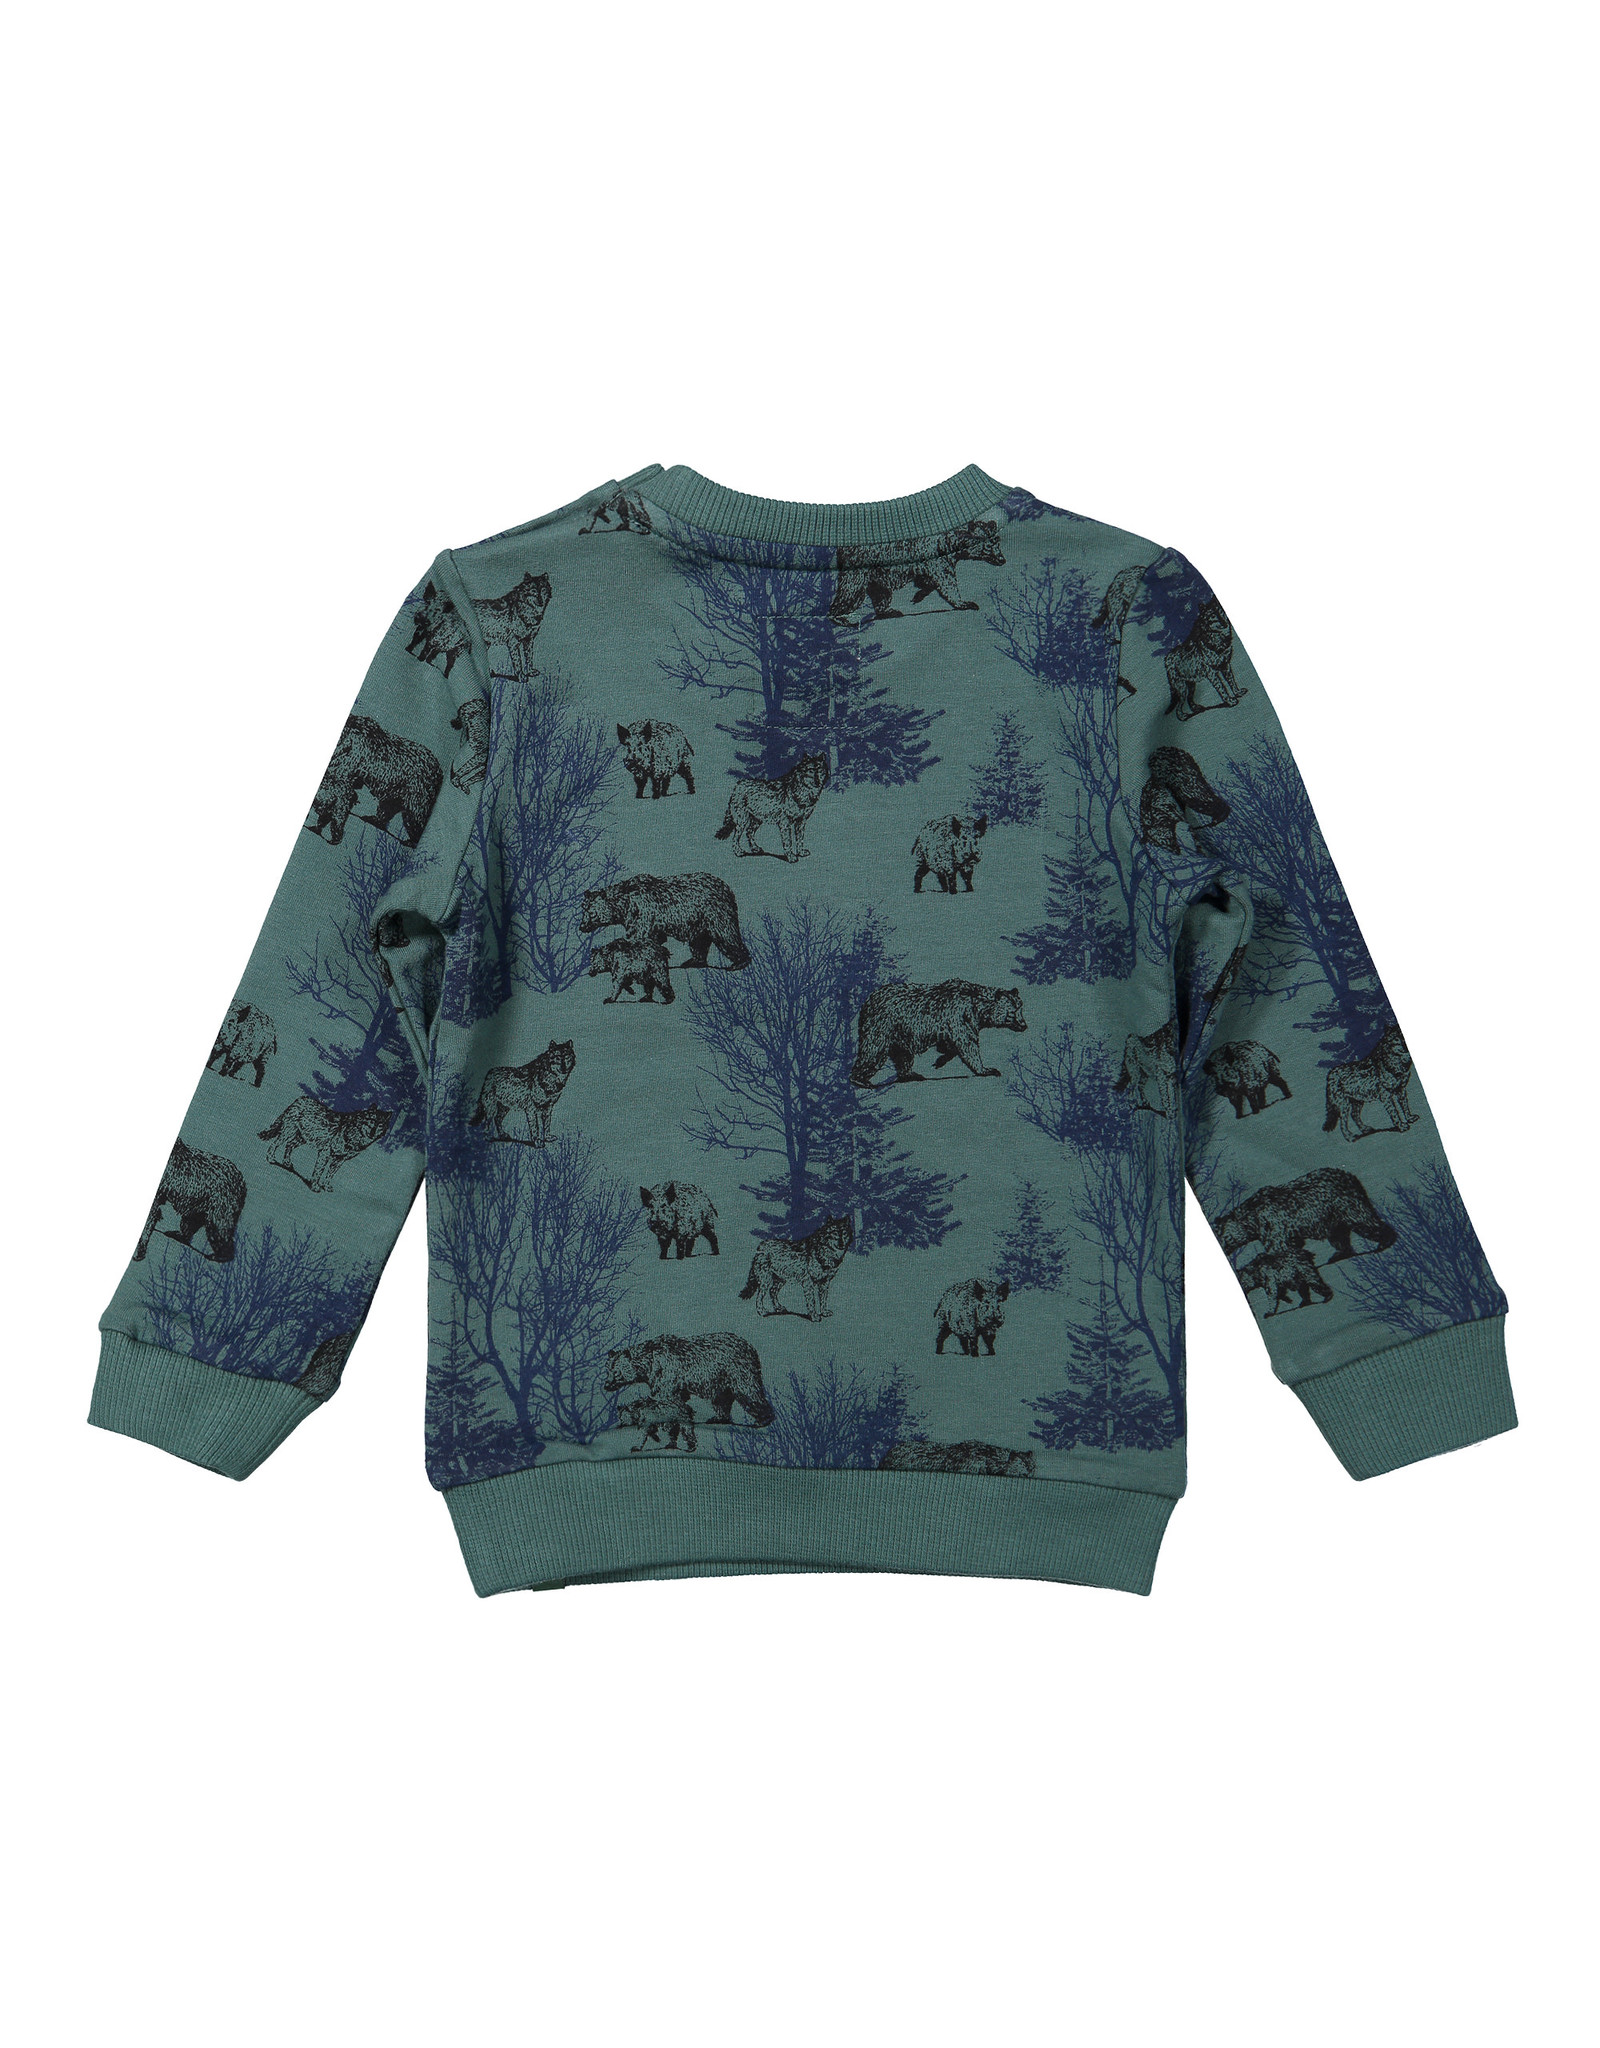 Koko Noko Boys Sweater ls Green + navy